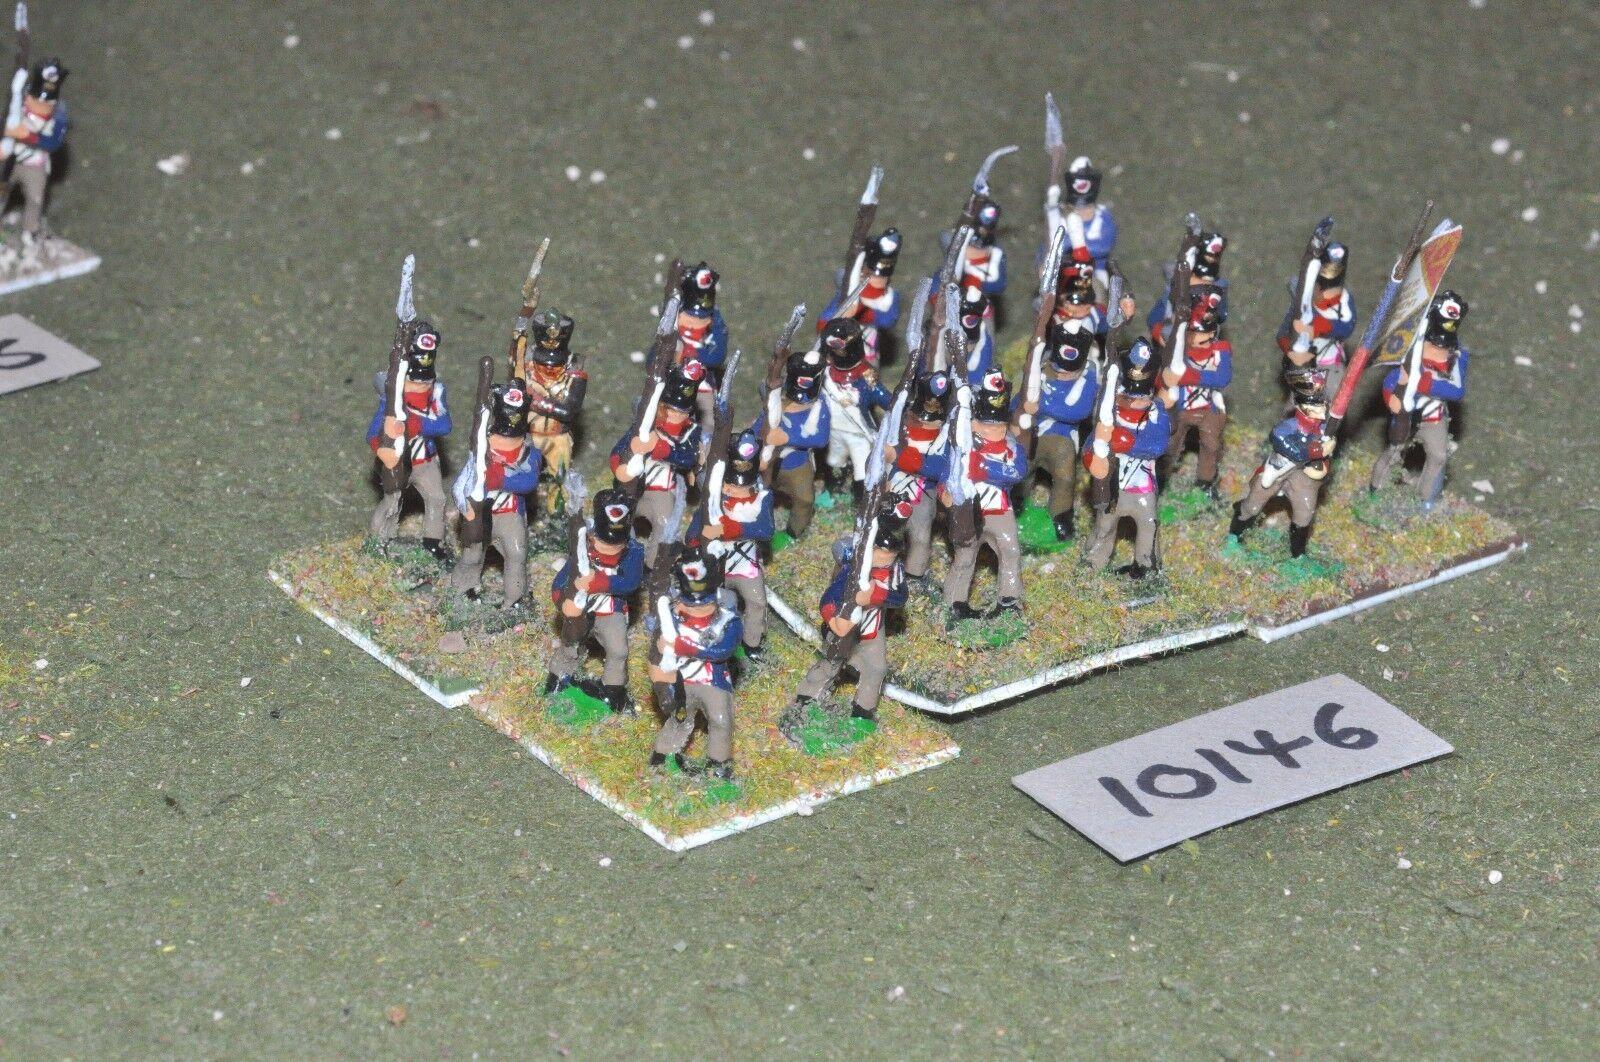 25mm Infantería Napoleónicas francés - 24-INF (10146)